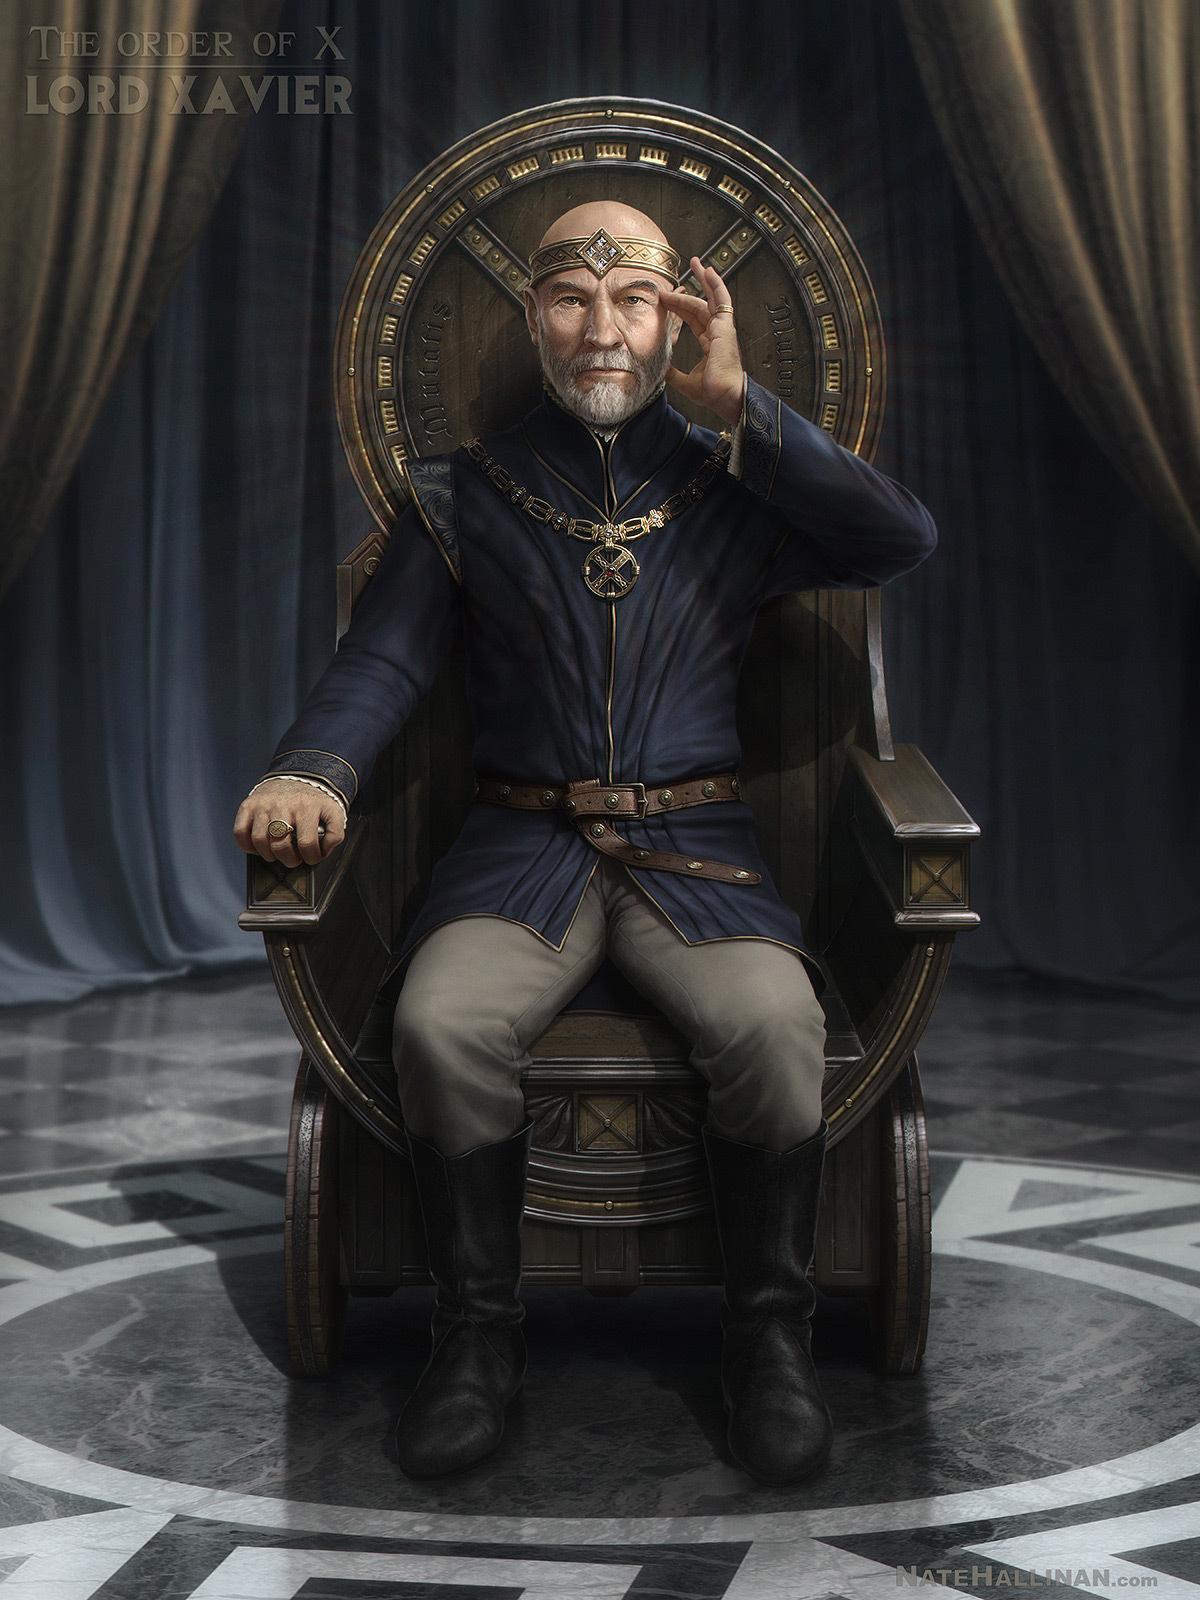 Innate lord xavier the orde 1 3ce6c15f 12nf